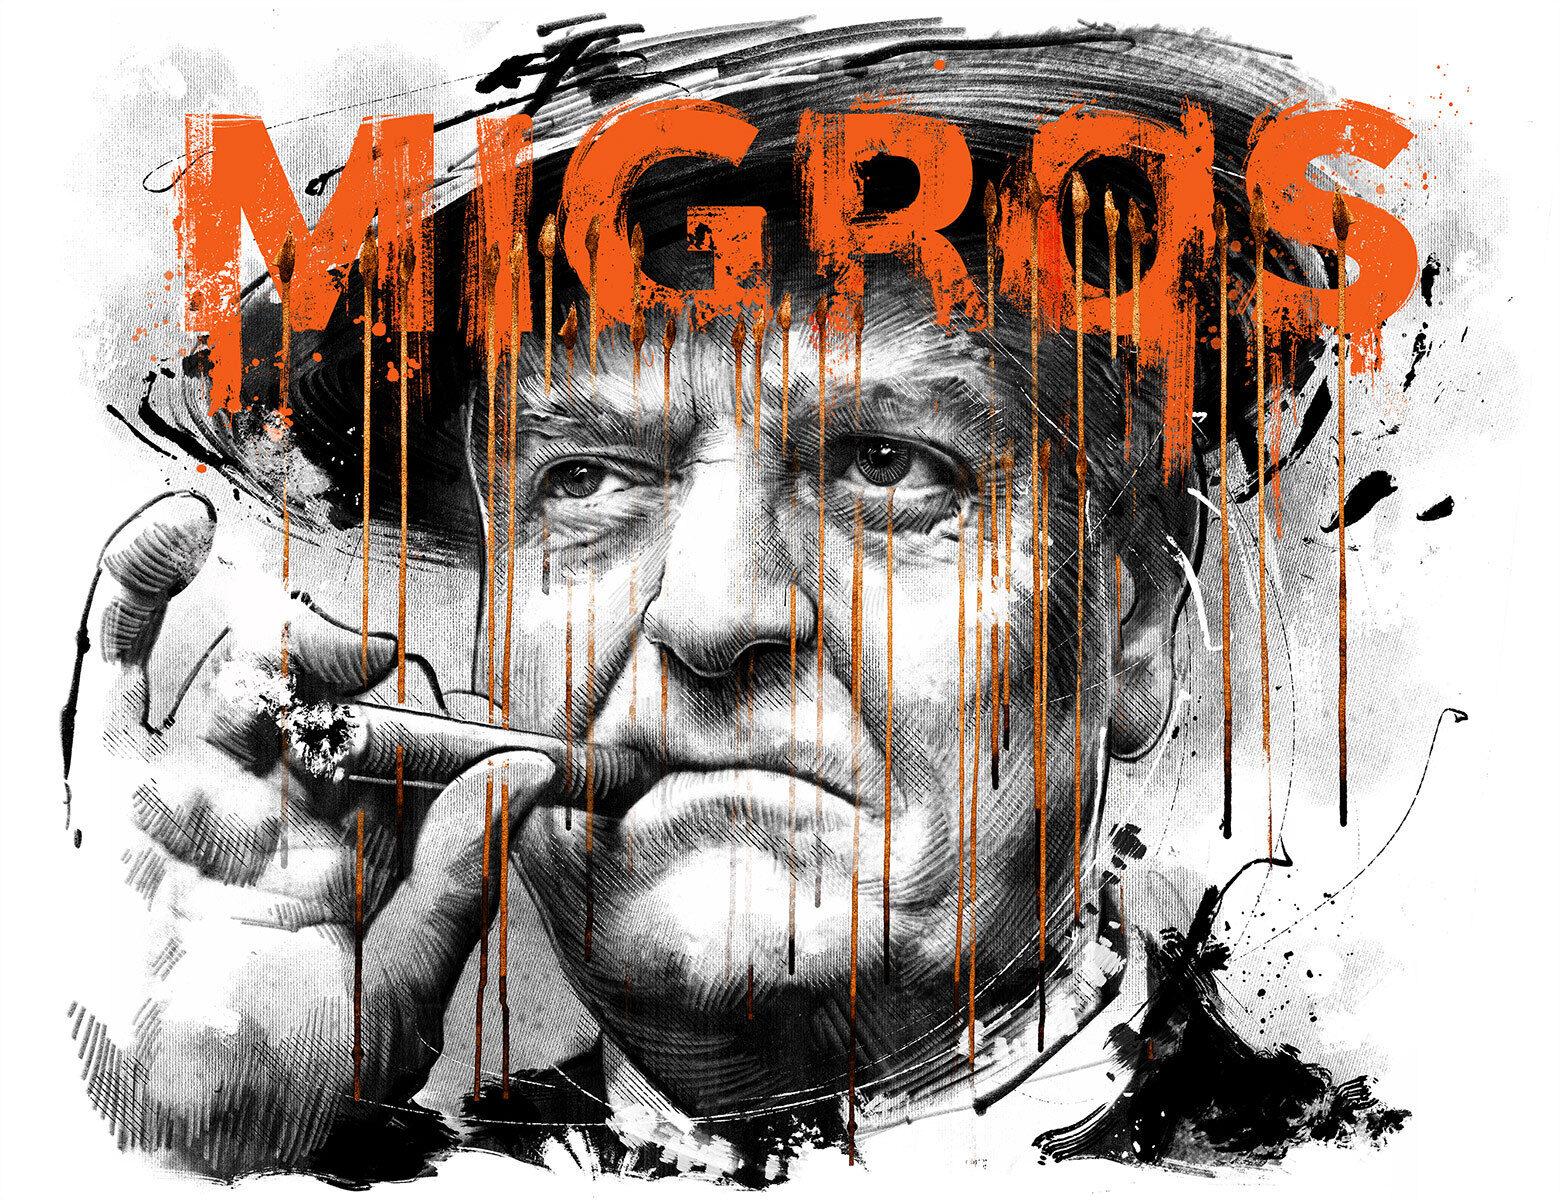 Migros tabak alkohol gttlieb duttweiler portrait ilustration editorial - Kornel Illustration   Kornel Stadler portfolio